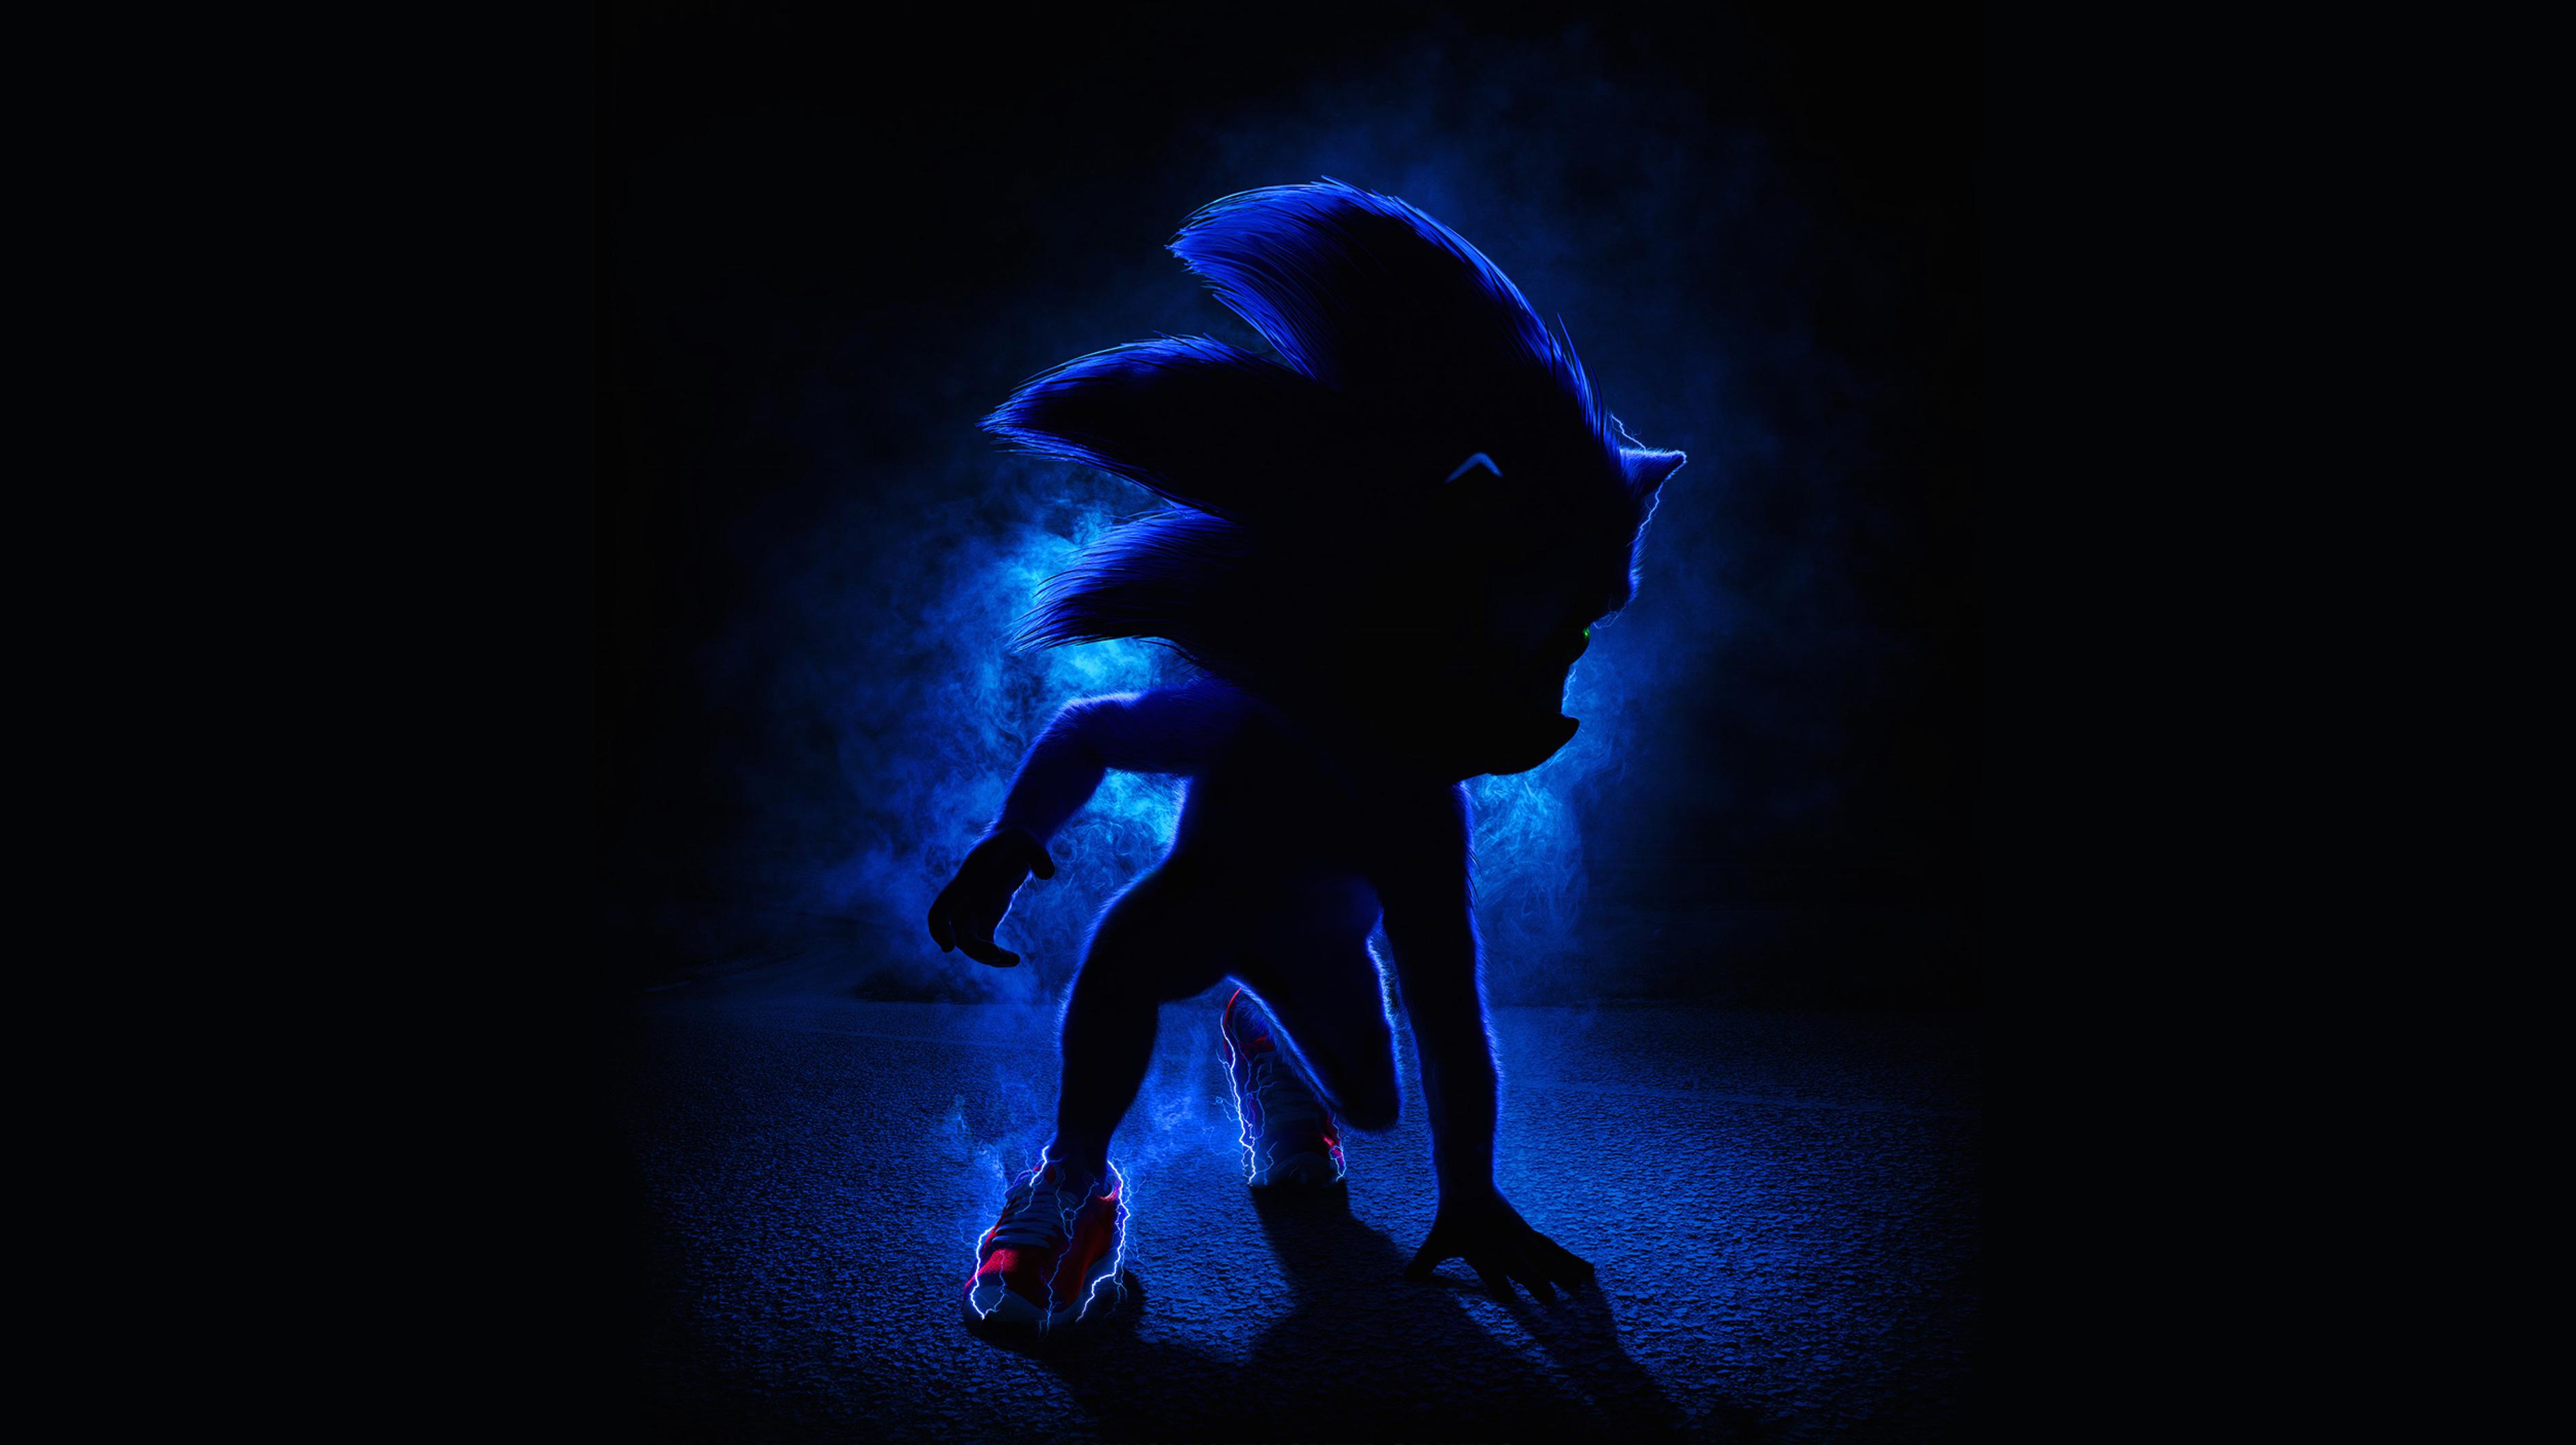 Sonic the Hedgehog 2019 Movie Poster Wallpaper HD Movies 4K 3762x2110